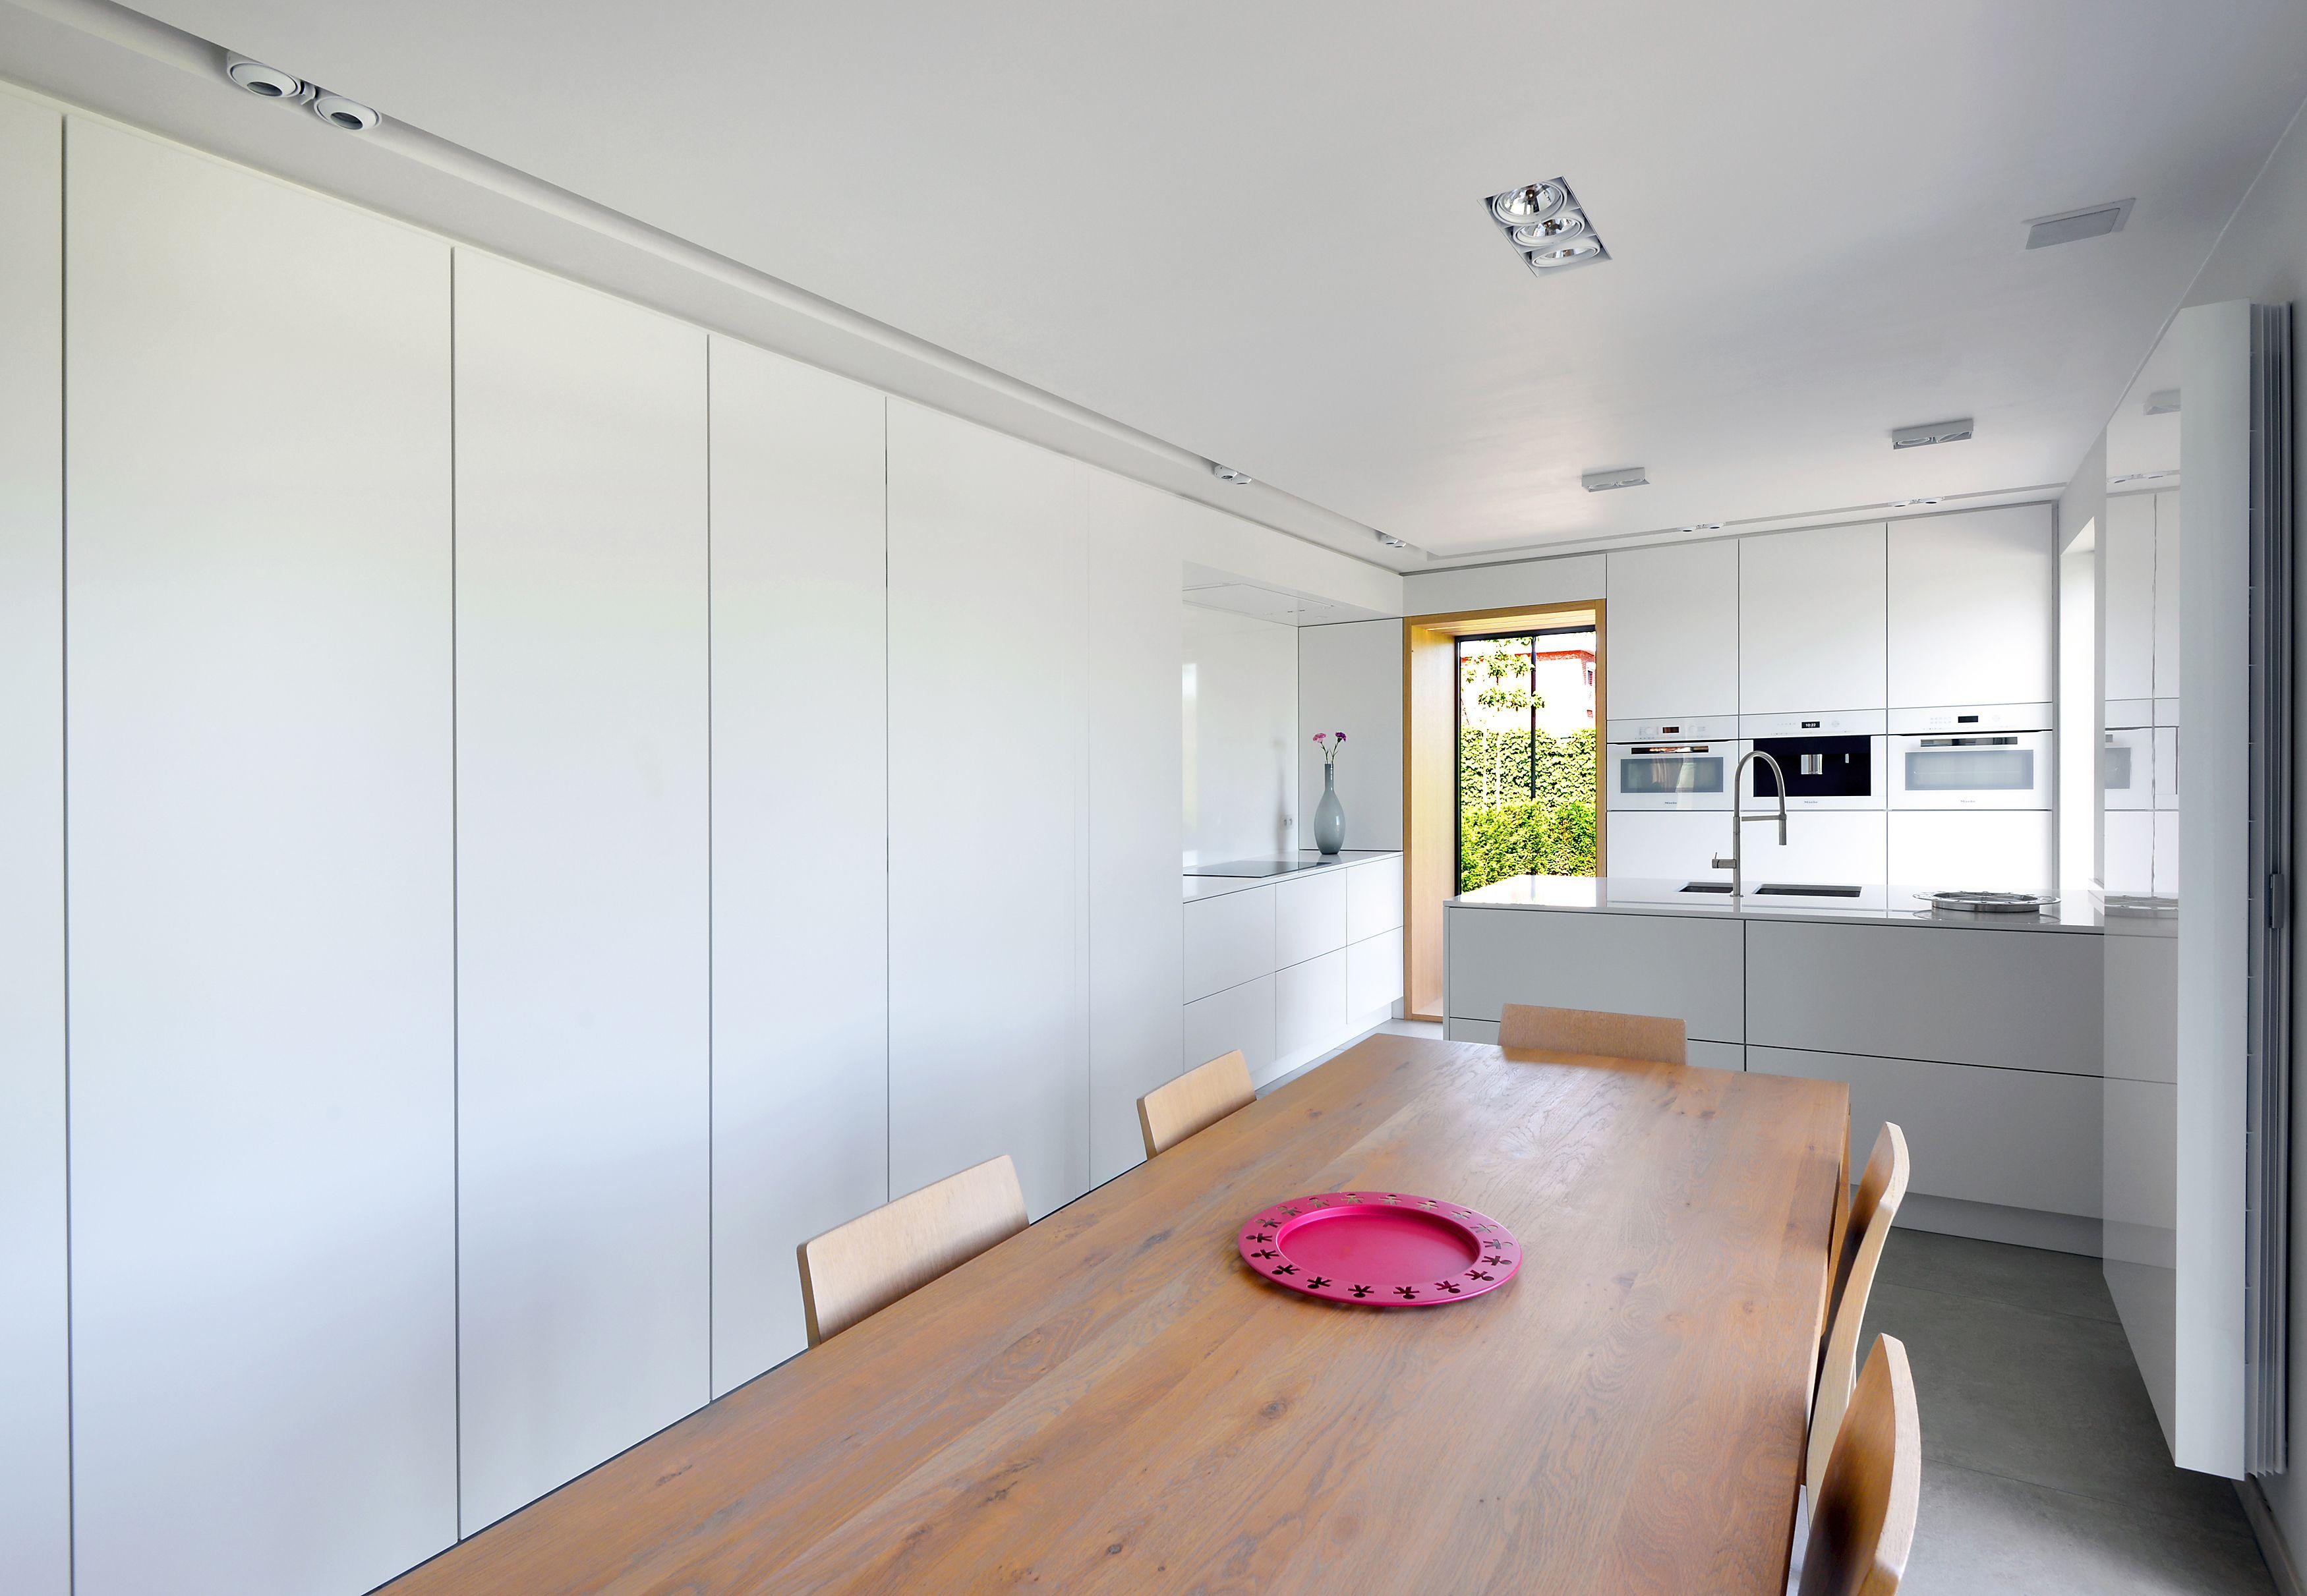 Keuken maarten smeets modern wit mat lak greeploos minimalistisch